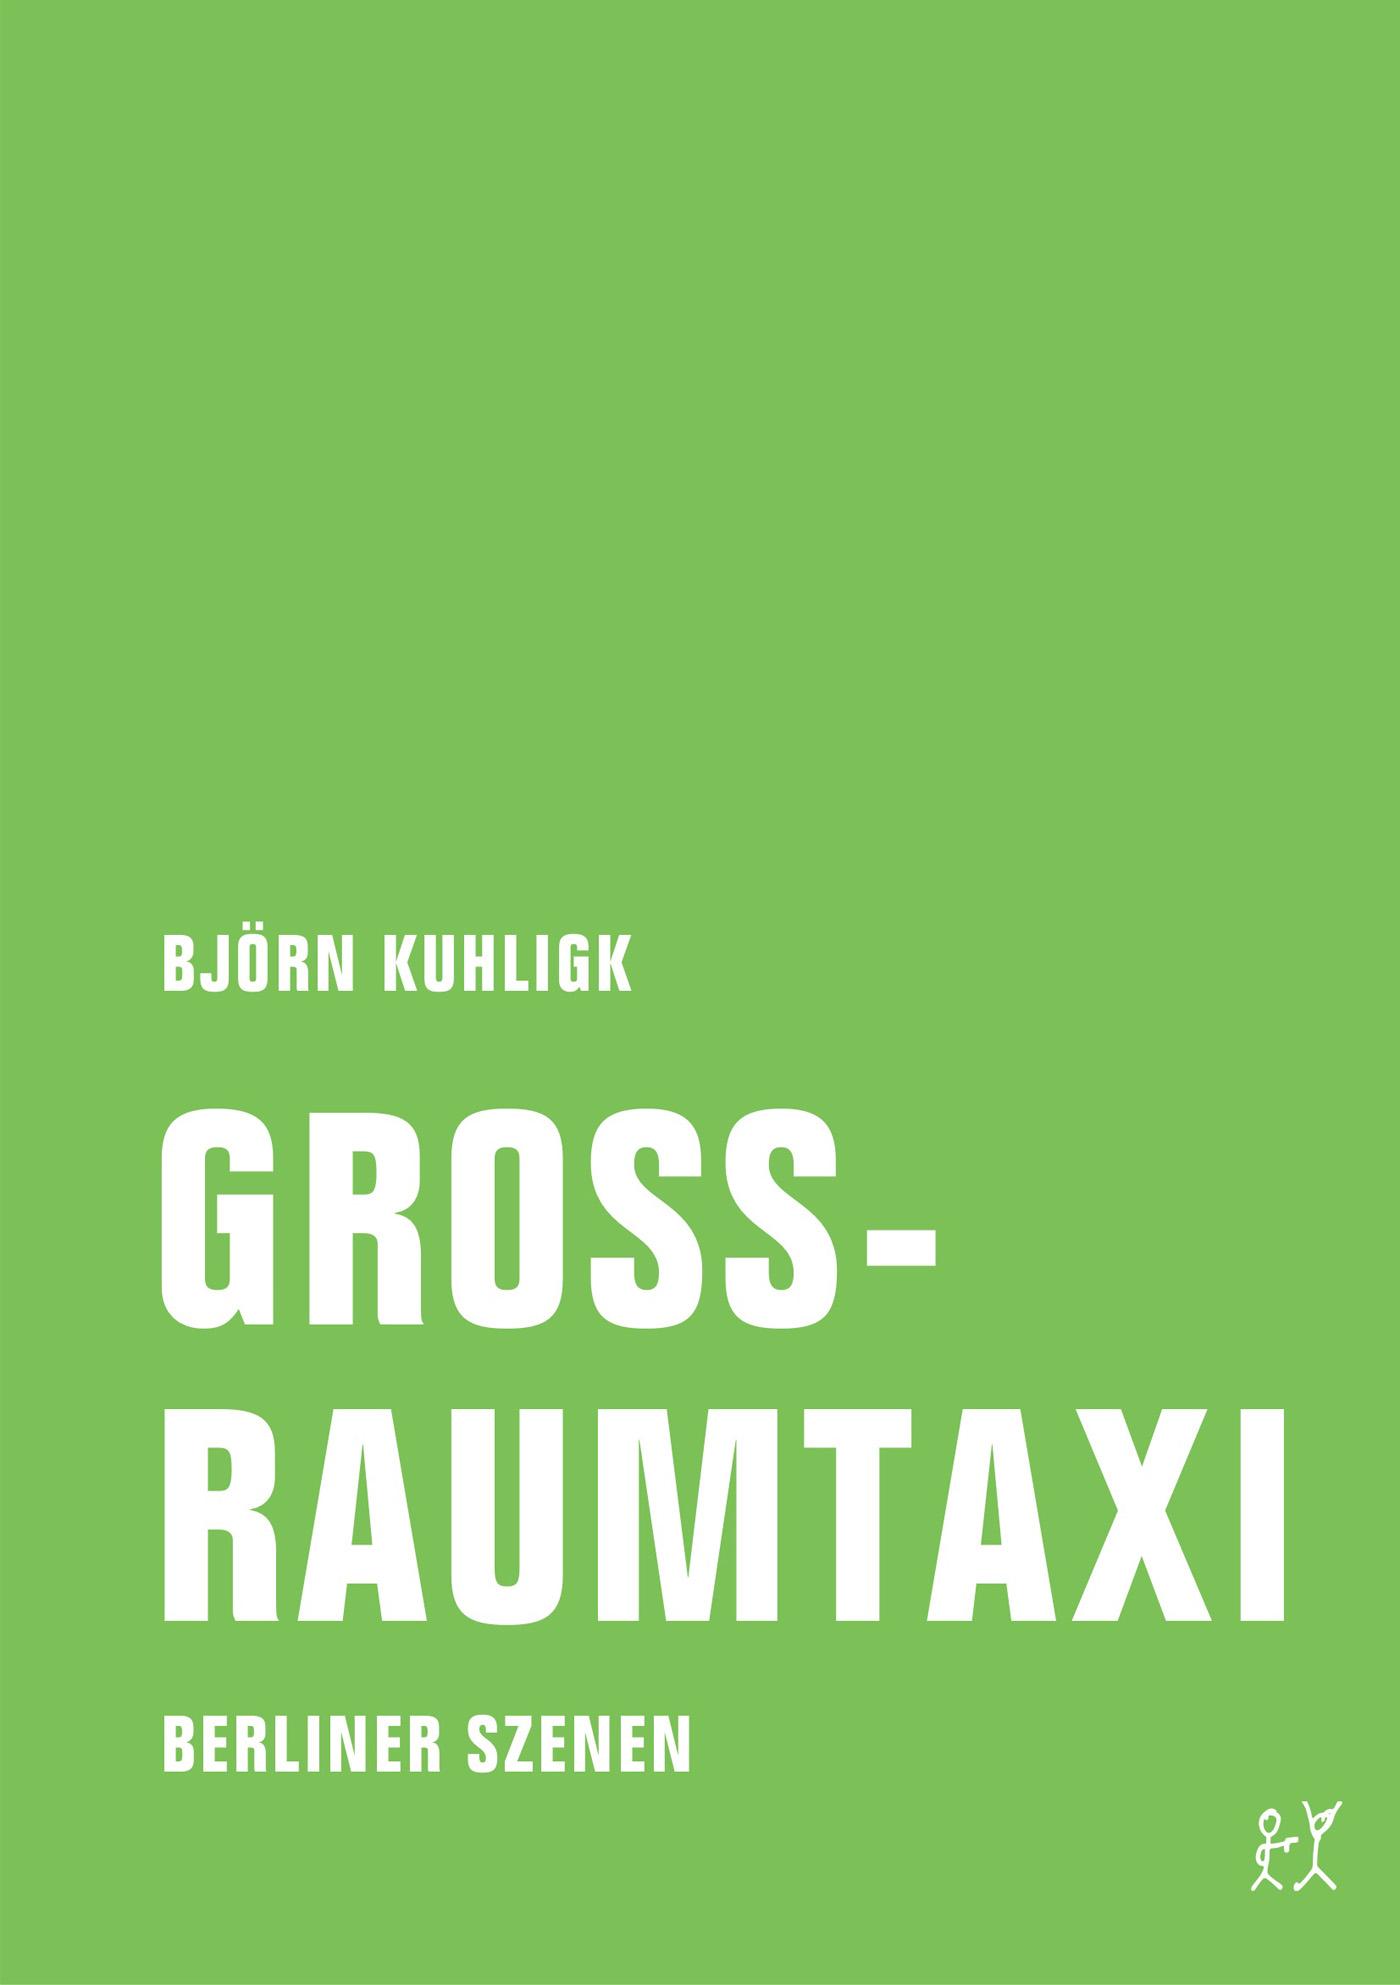 Bjorn Kuhligk Großraumtaxi